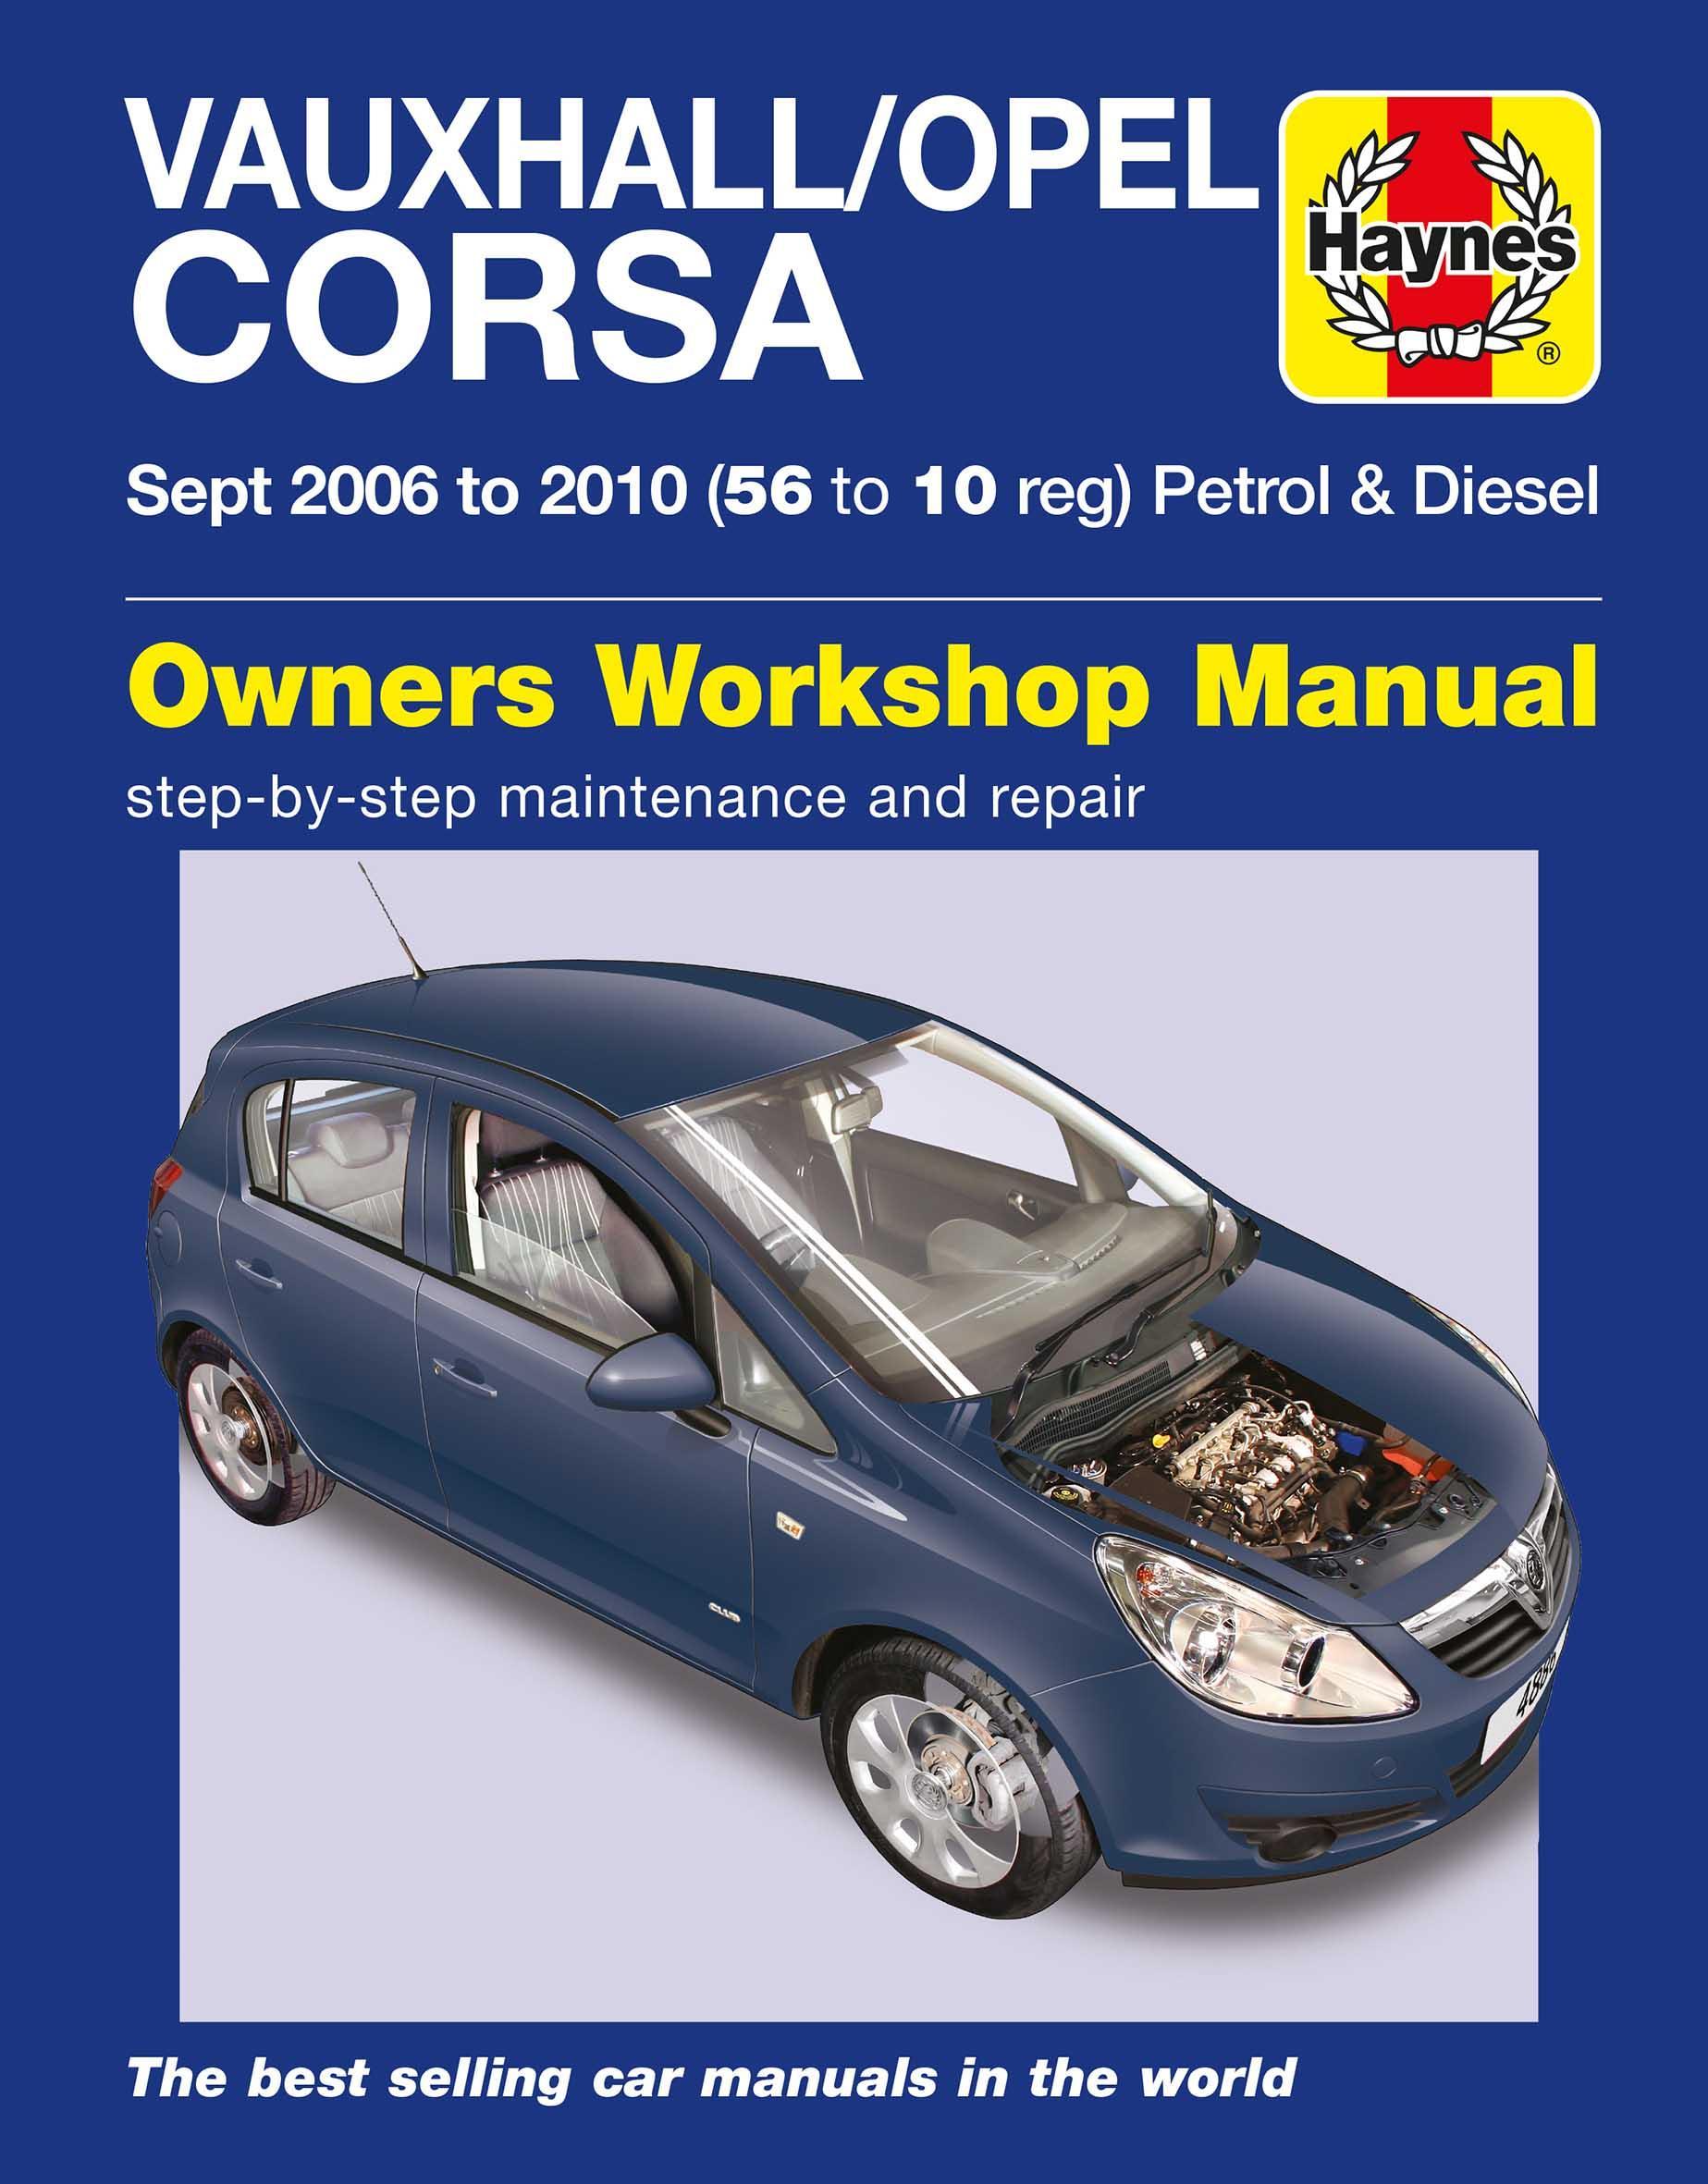 haynes vauxhall opel corsa sept 06 rh halfords com vauxhall corsa owners manual 2006 pdf Old Vauxhall Corsa